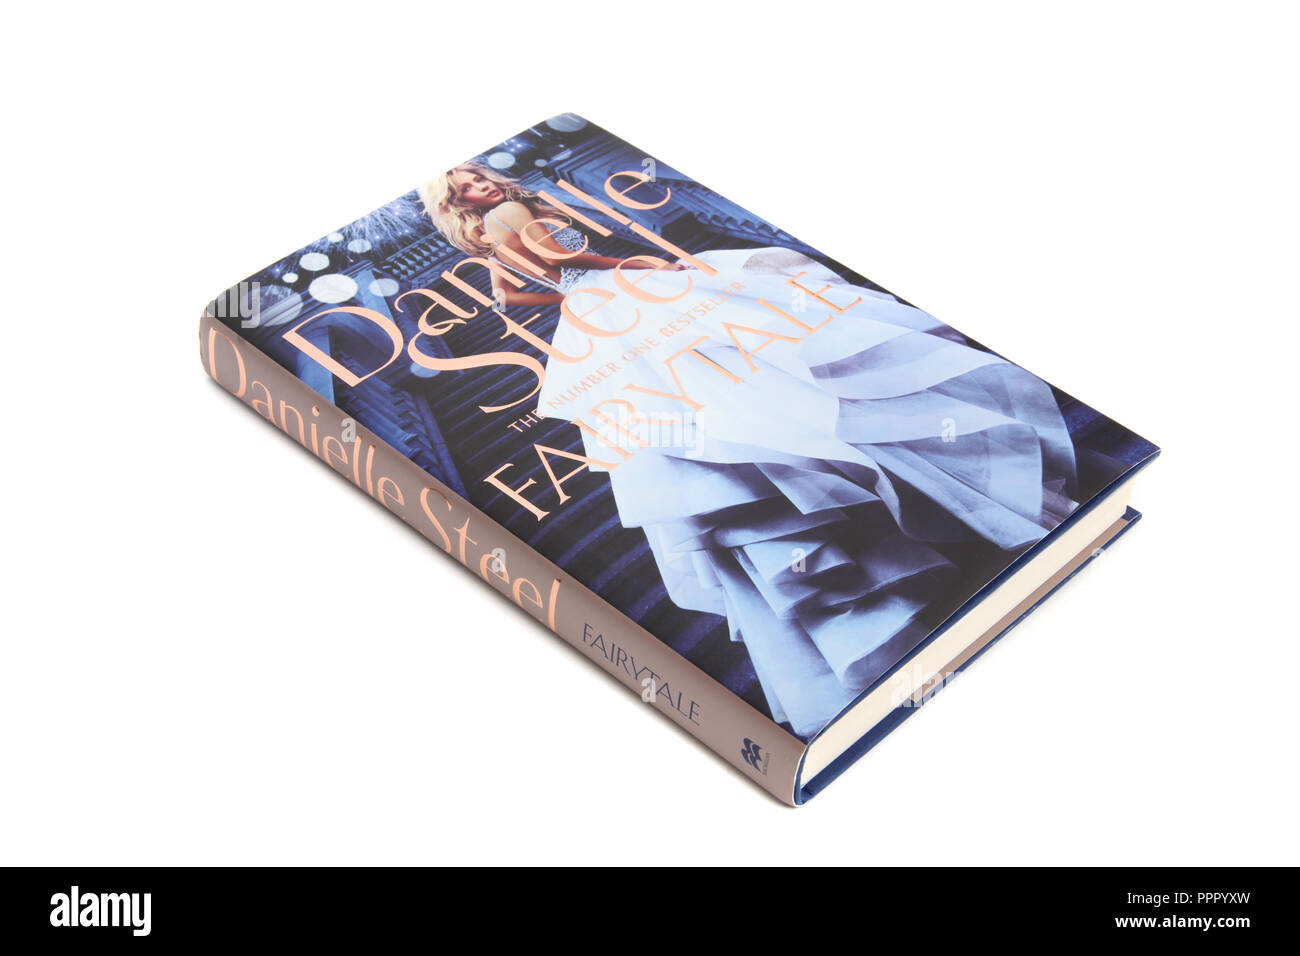 The novel Fairytale by Danielle Steel. - Stock Image